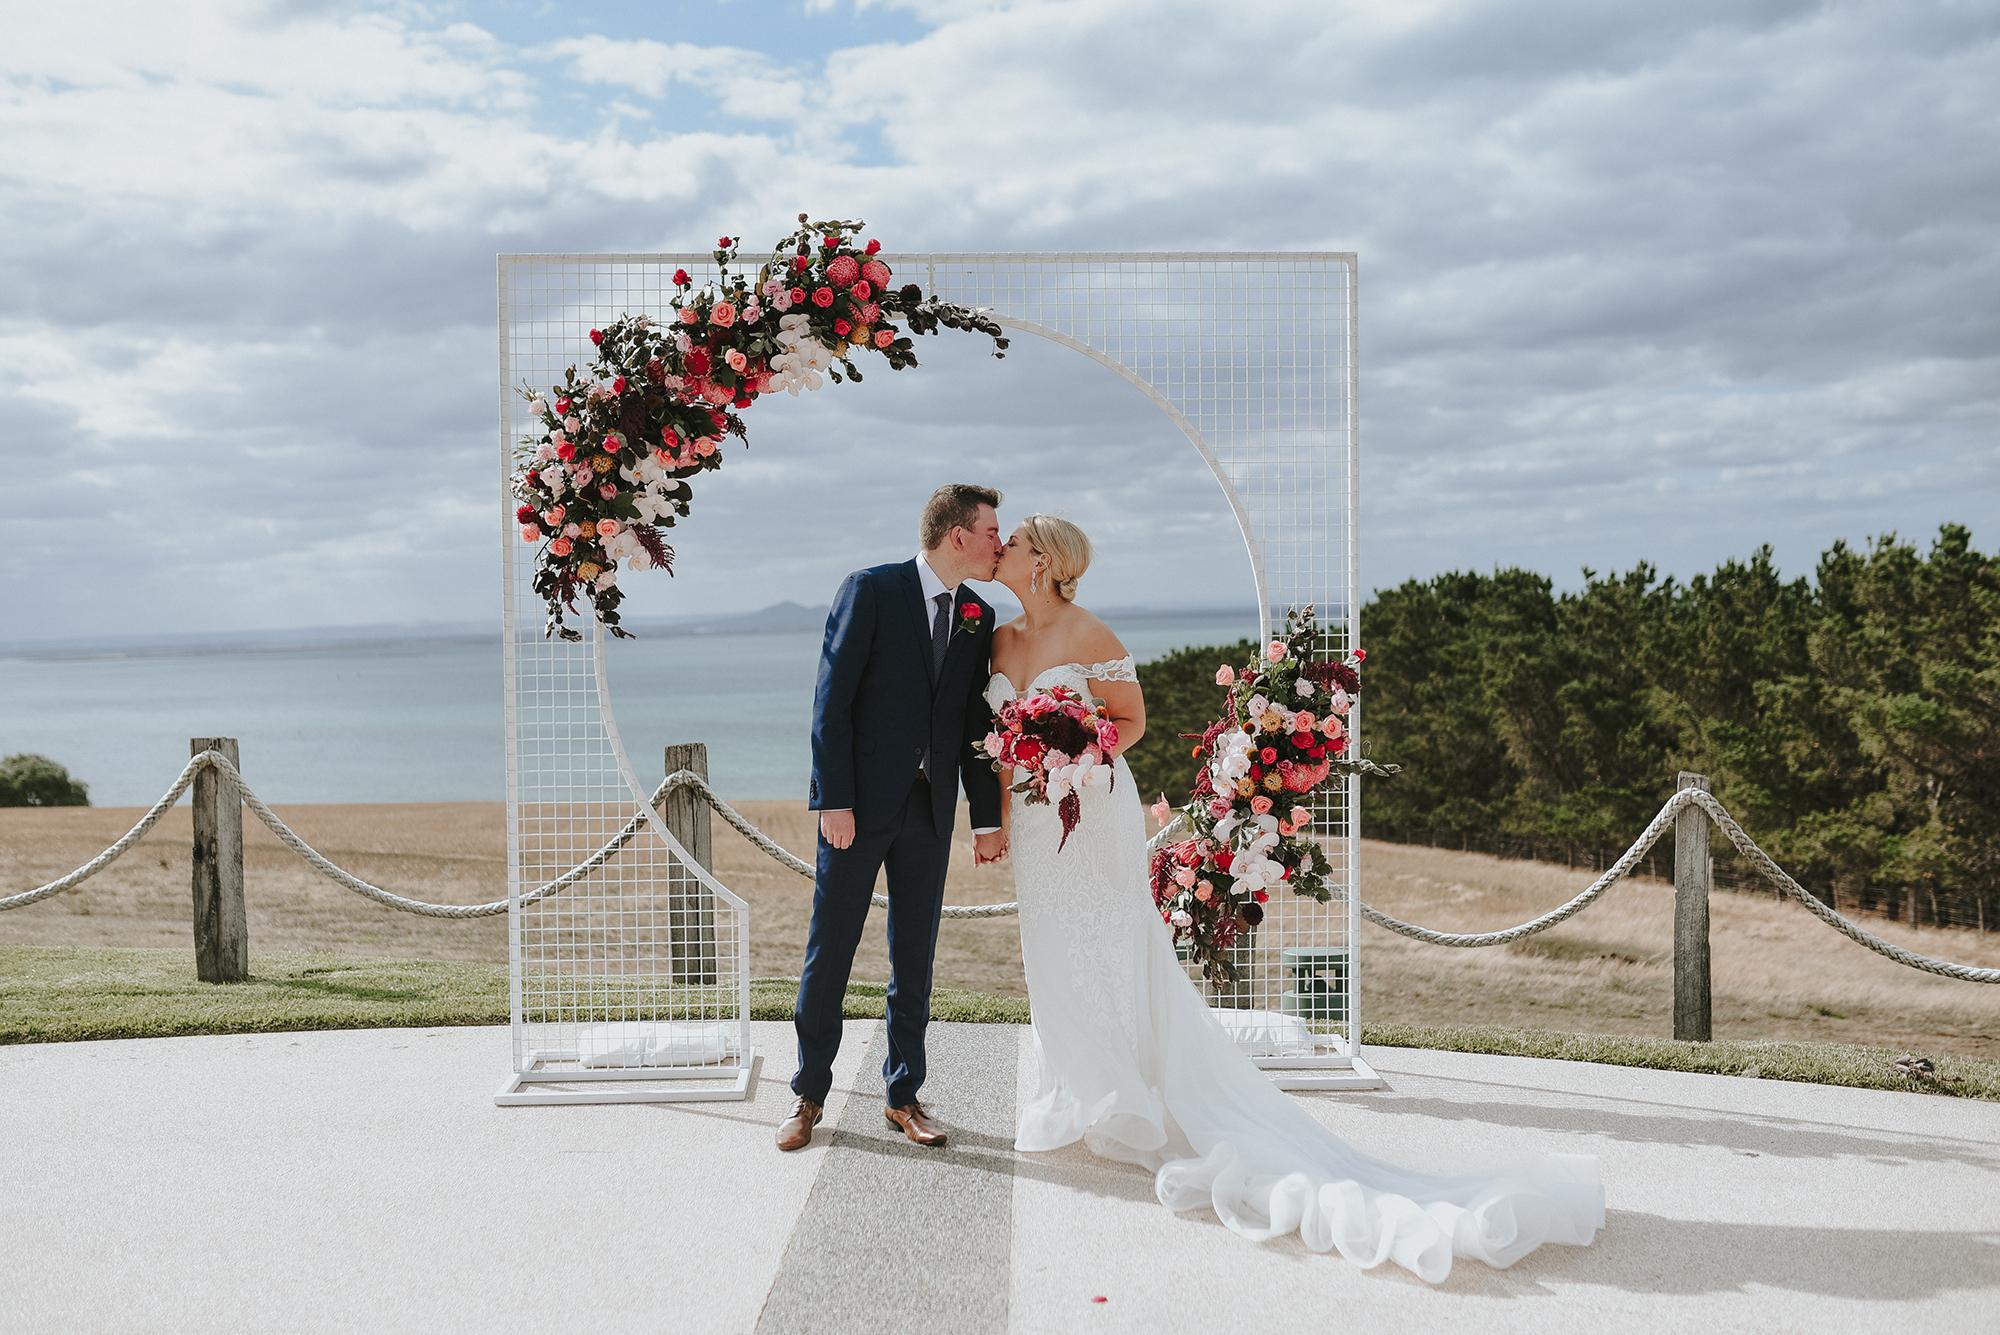 Smitten wedding photography (9)